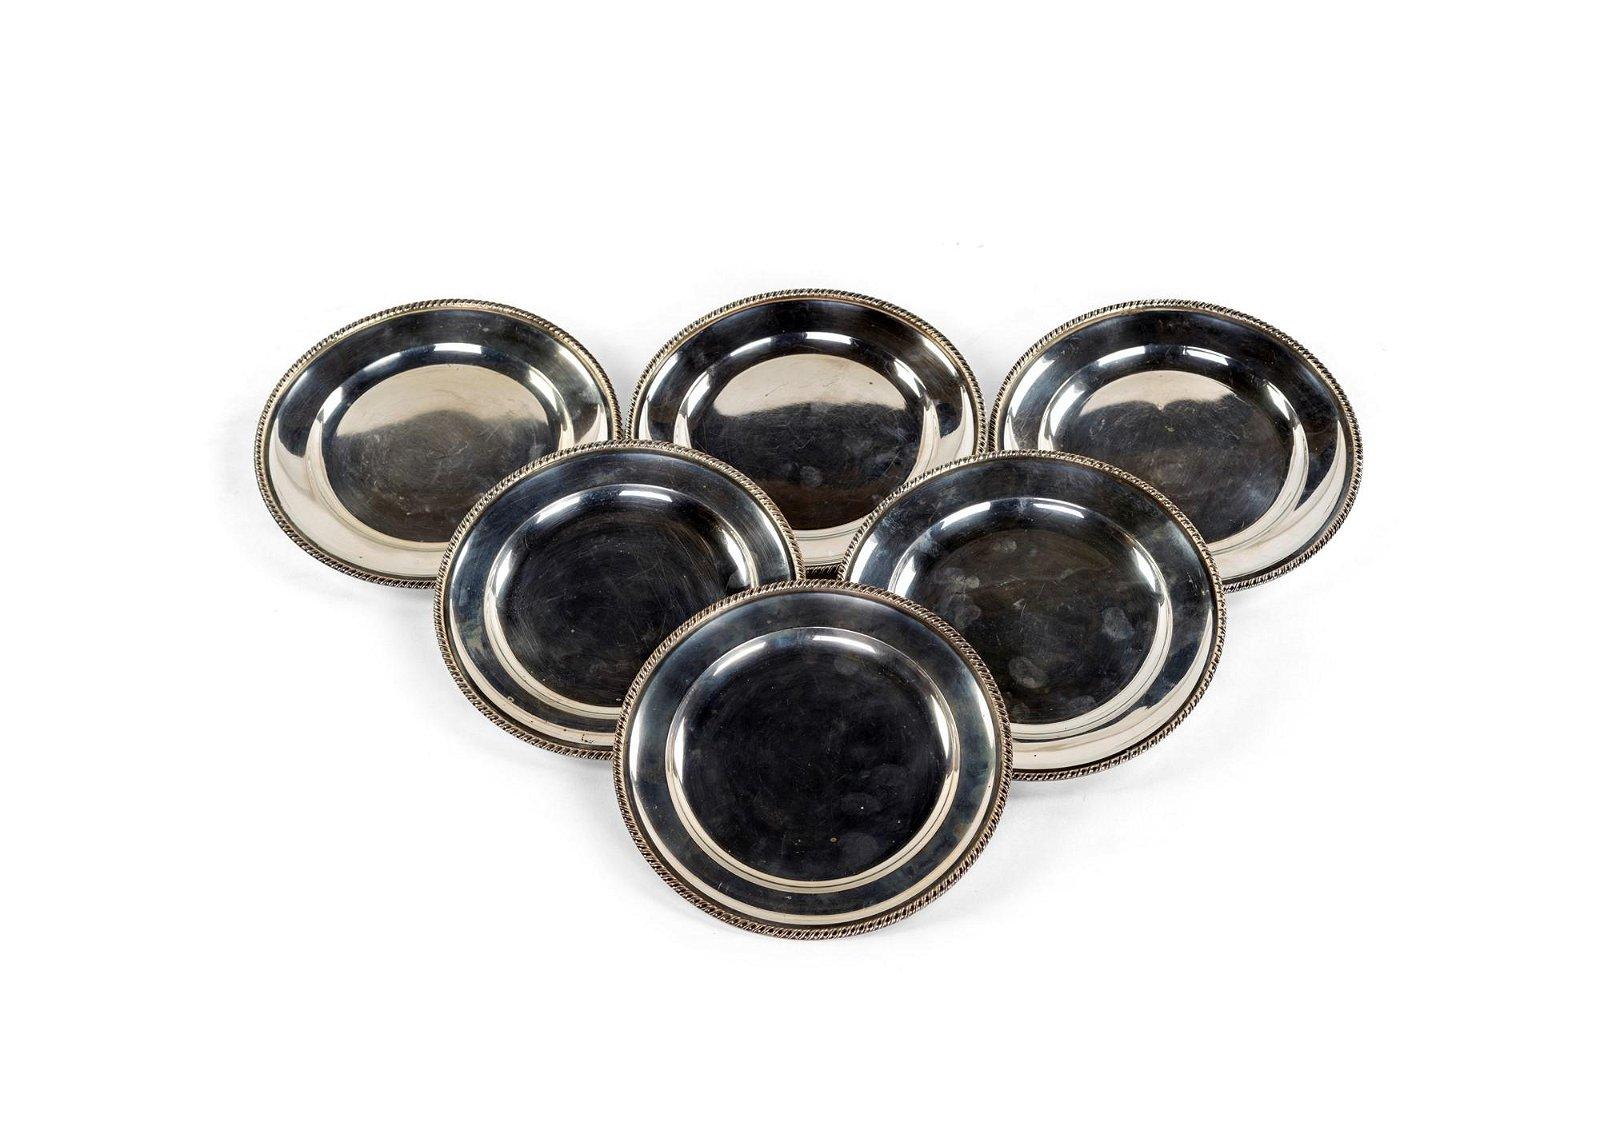 Six silver plates